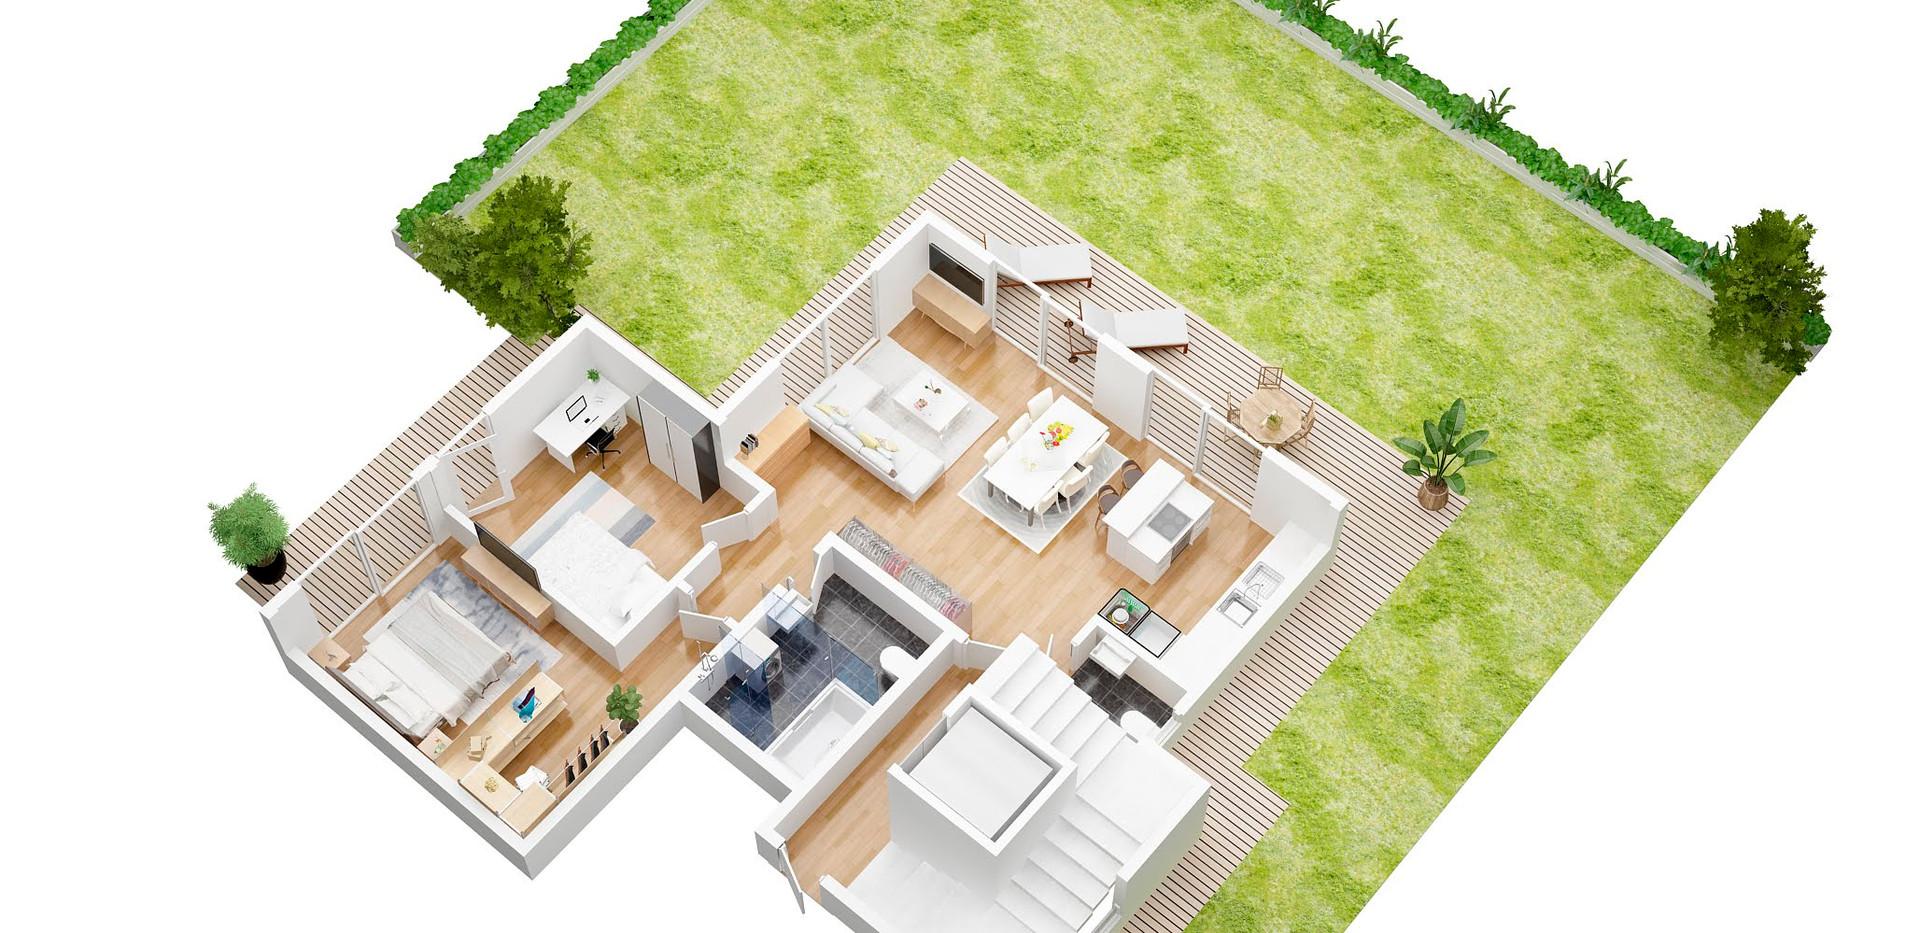 ruffy_extra_3D  floor plan garden